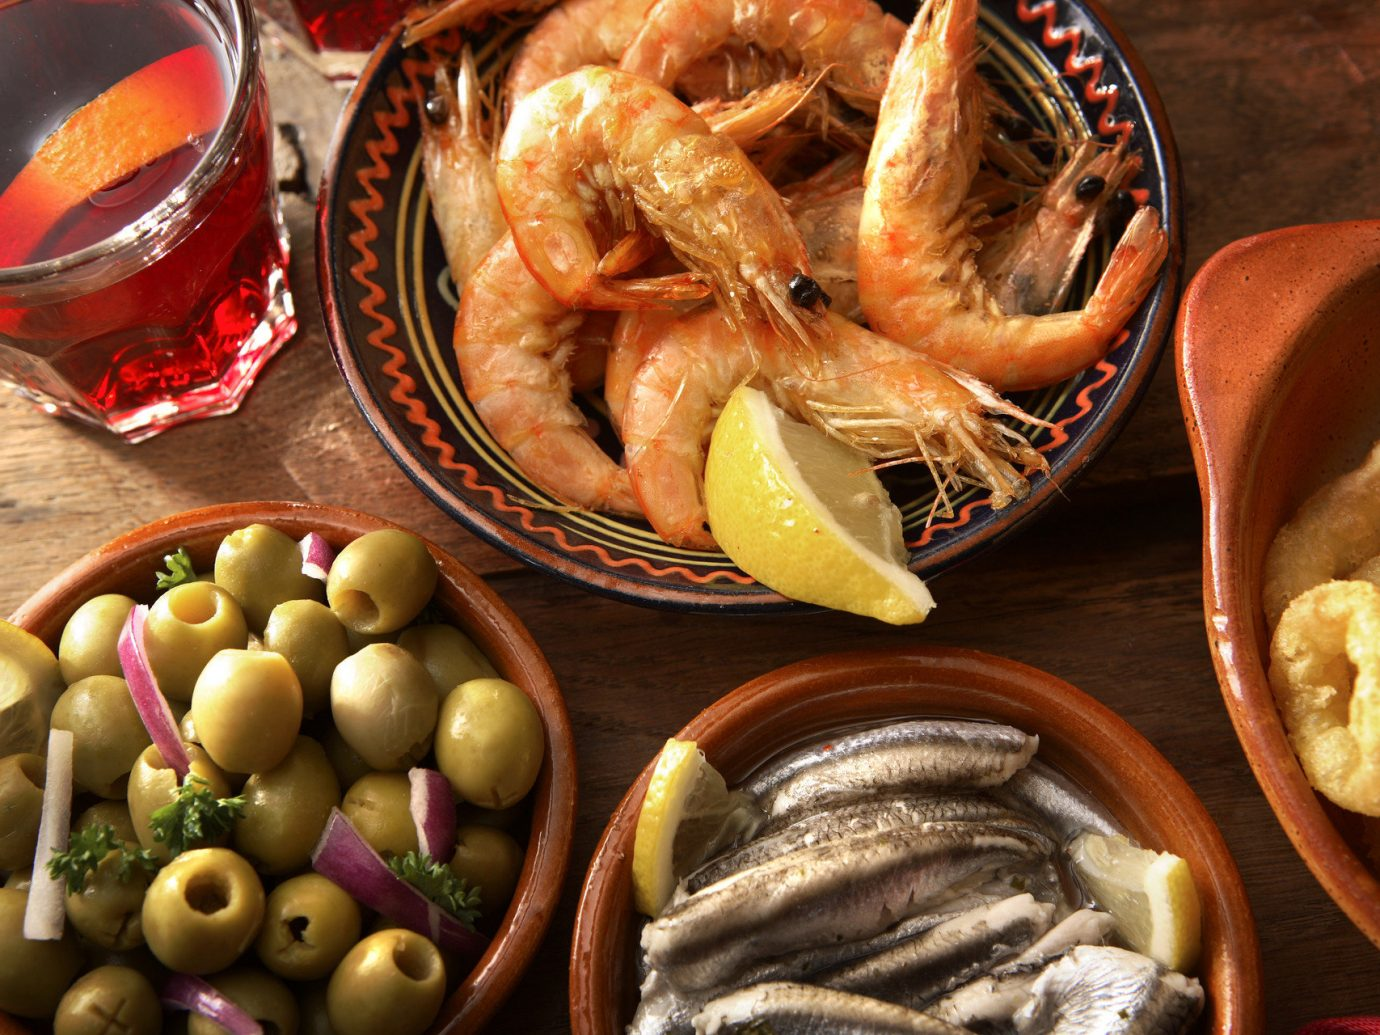 Romance Trip Ideas food dish cuisine meal produce asian food Seafood vegetable